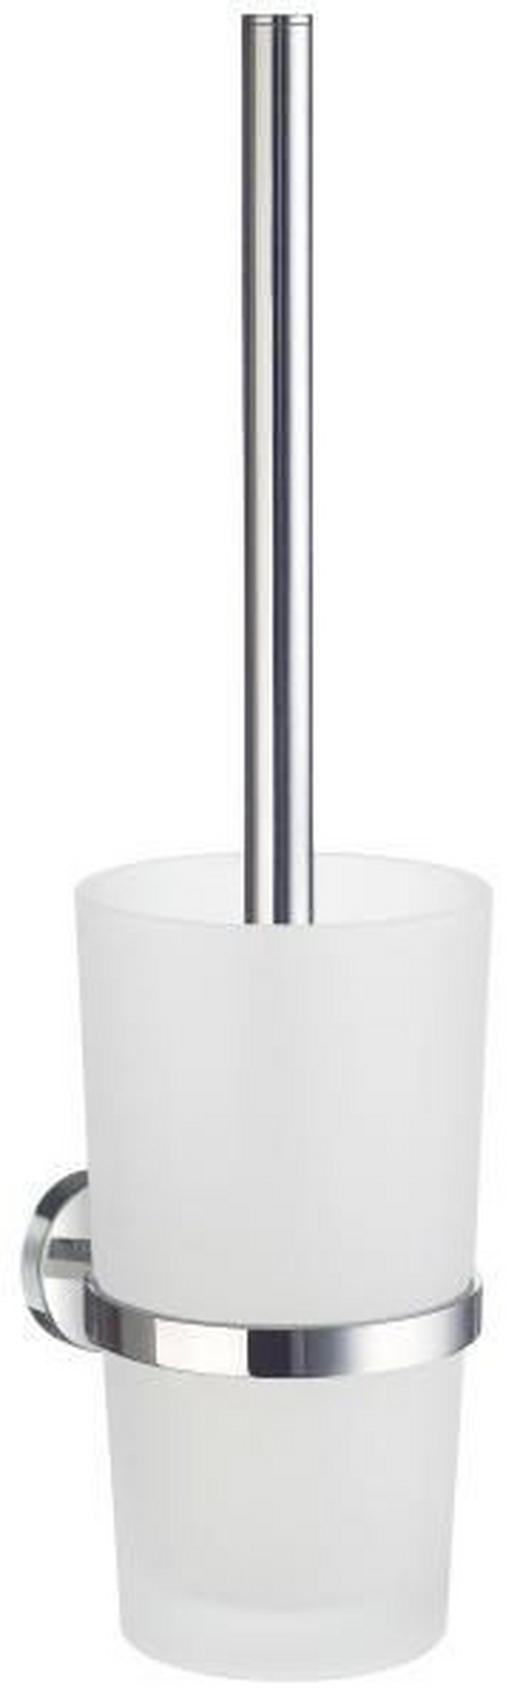 WC-BÜRSTENGARNITUR in Metall - Chromfarben, Basics, Glas/Kunststoff (11,9/38cm)